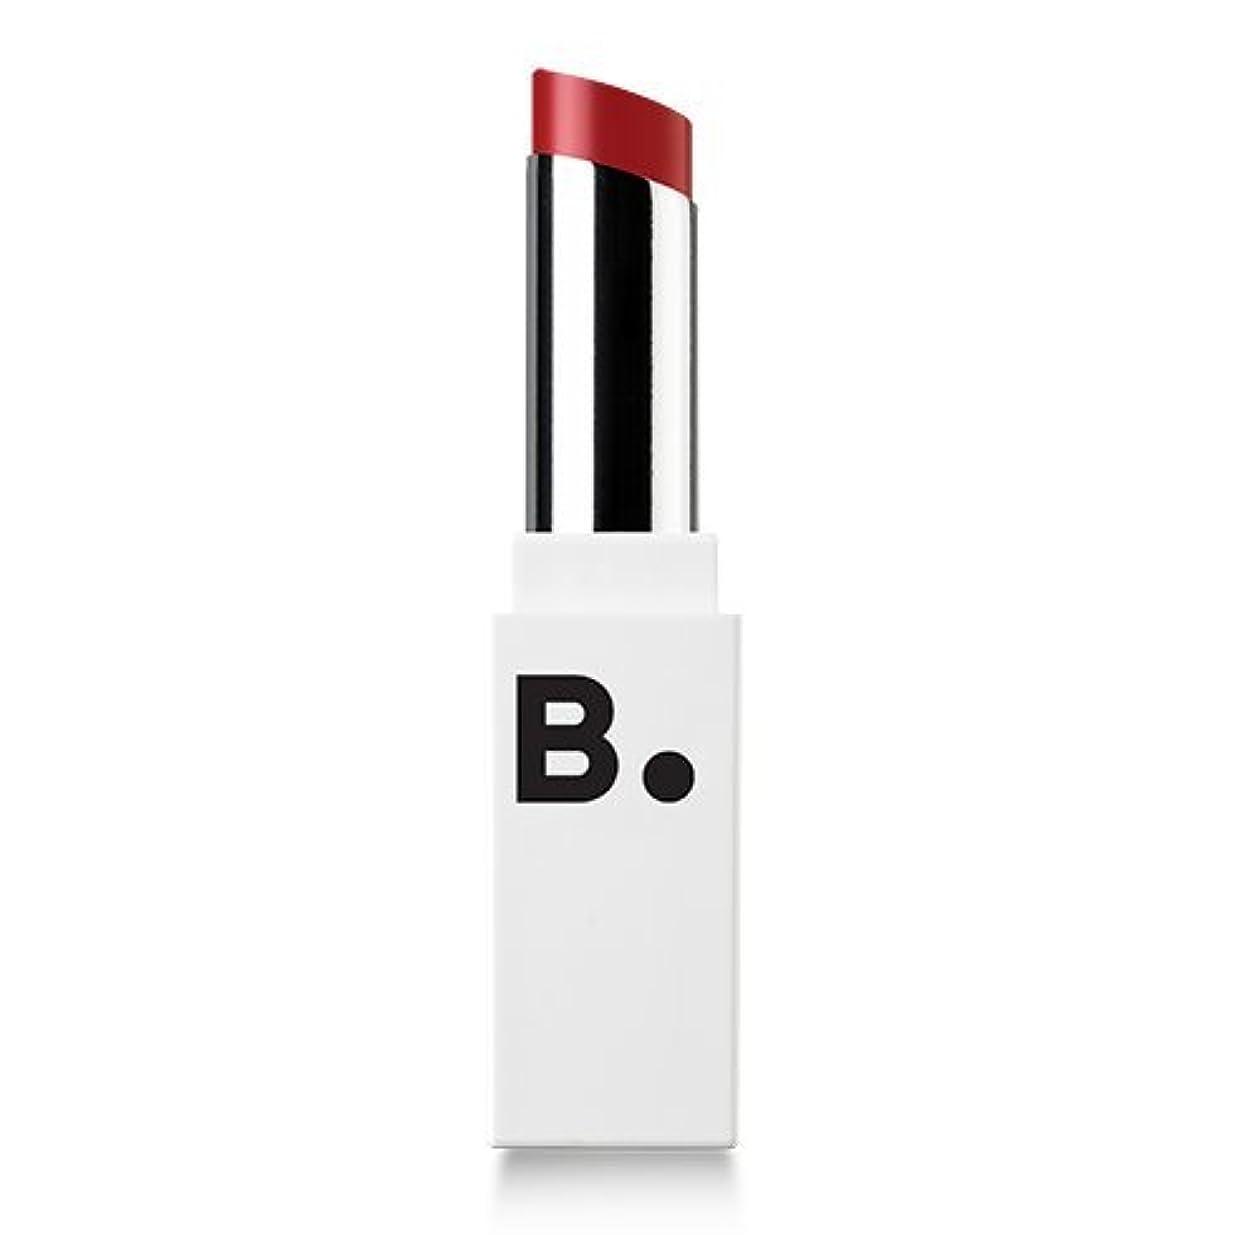 BANILA CO Lip Draw Melting Serum Stick 4.2g/バニラコ リップ ドロー メルティング セラム スティック 4.2g (#SRD01 Gun Red) [並行輸入品]